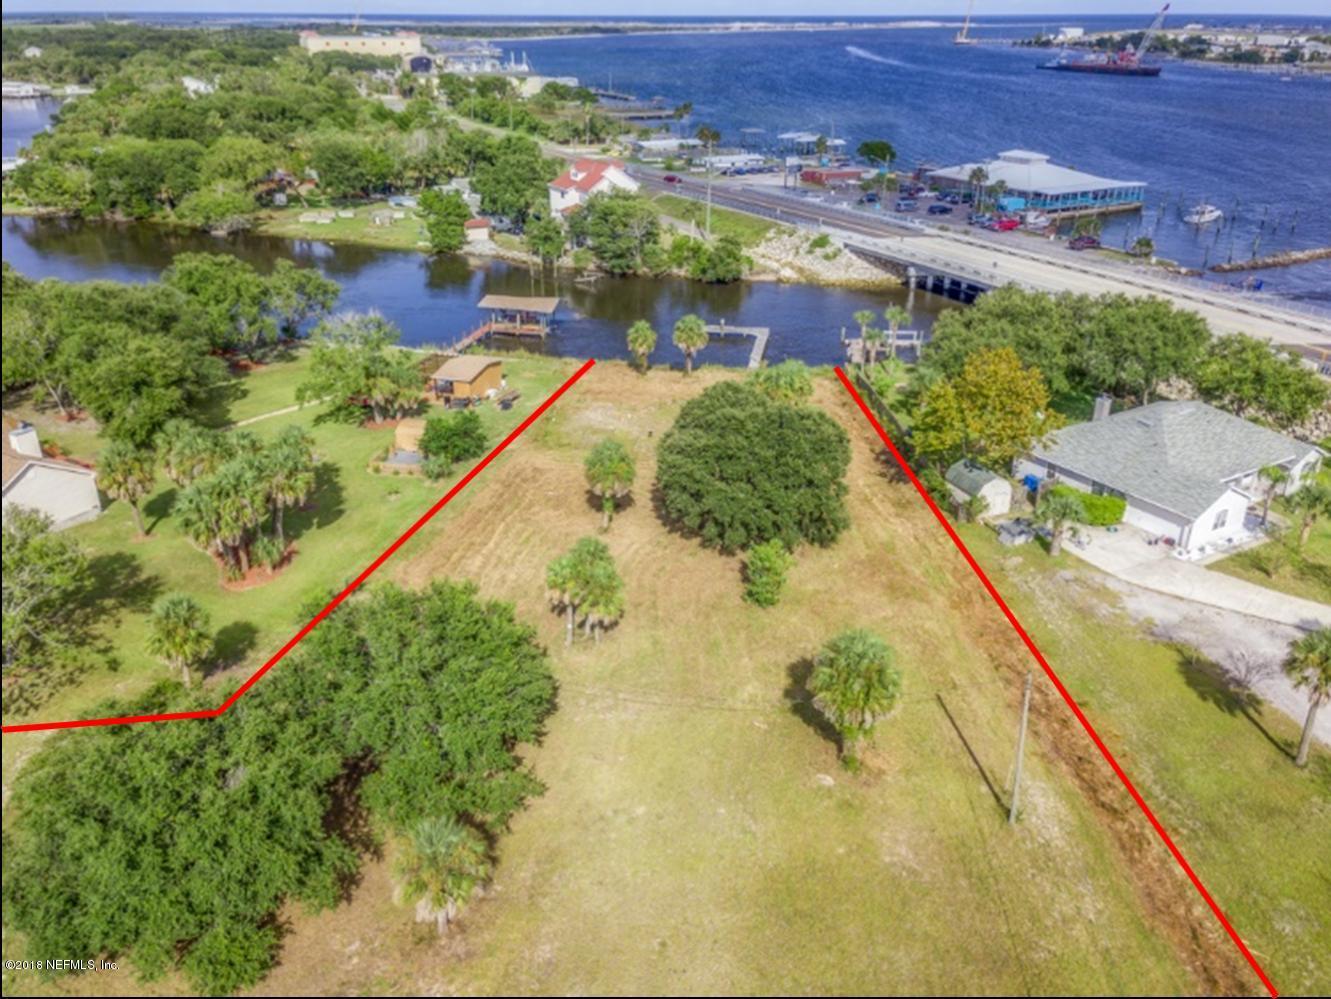 9206 SHAD CREEK, JACKSONVILLE, FLORIDA 32226, ,Vacant land,For sale,SHAD CREEK,959318